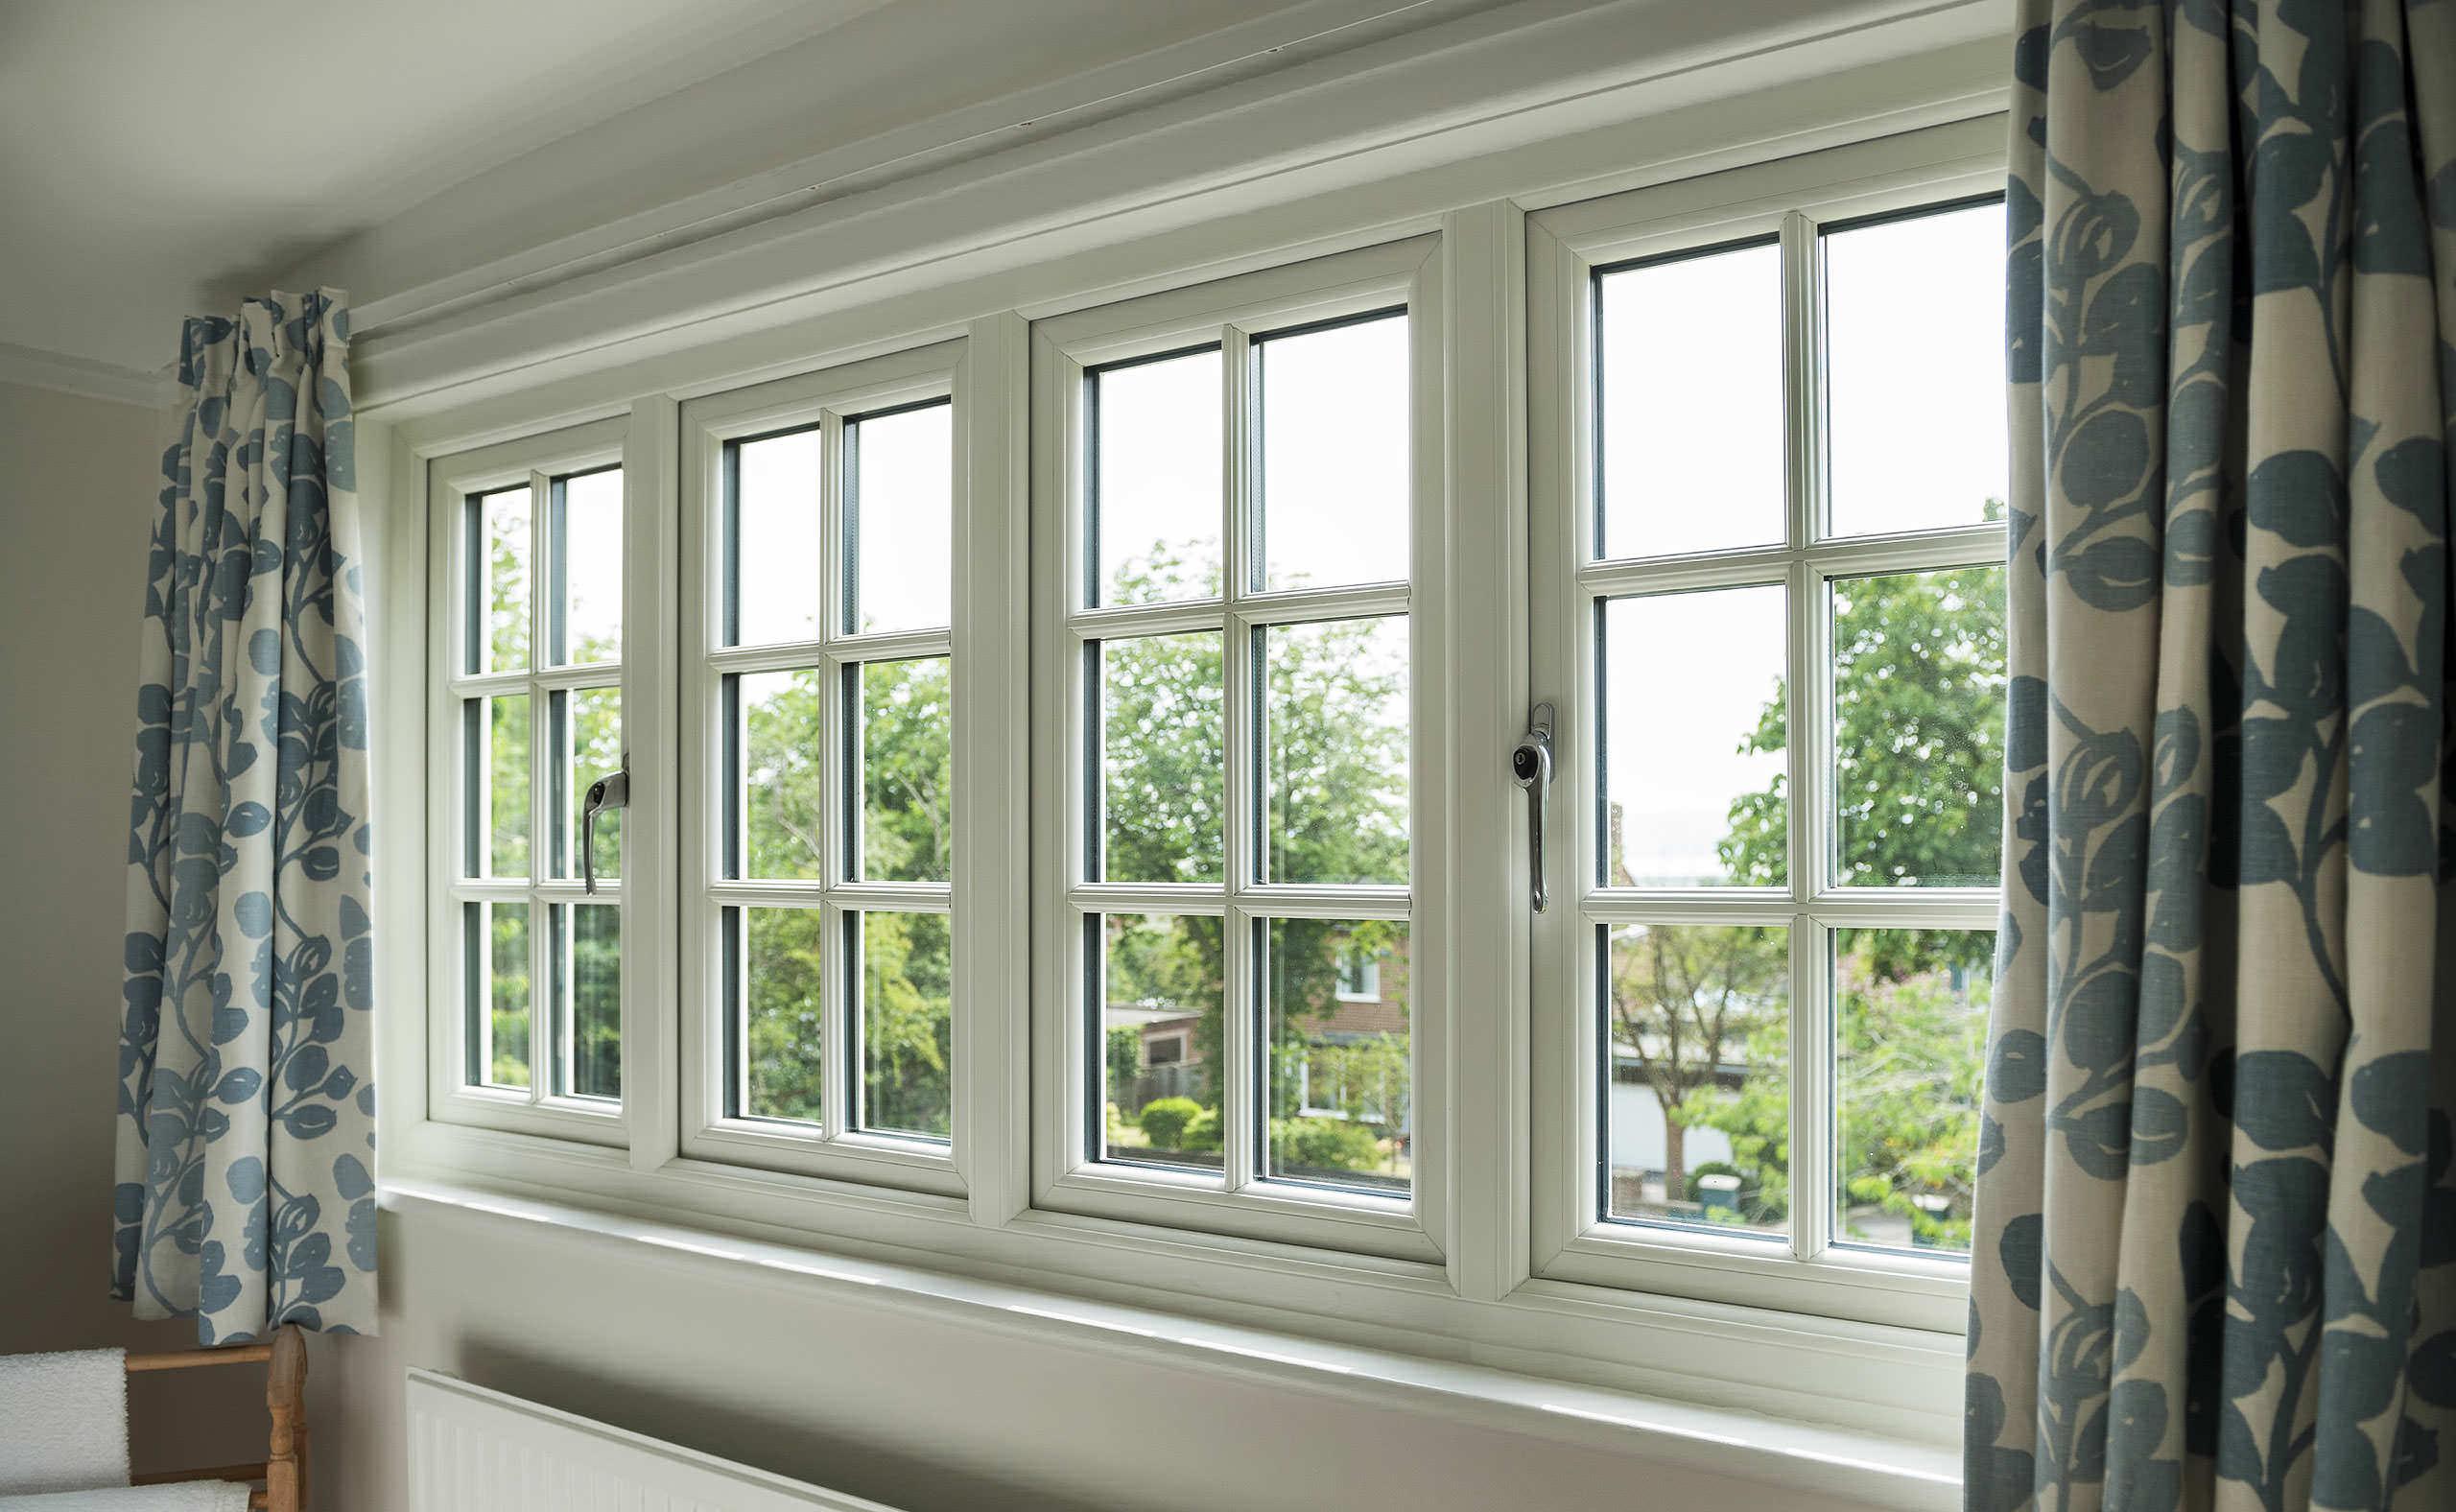 Upvc windows aluminium windows sternfenster window systems for 2 window